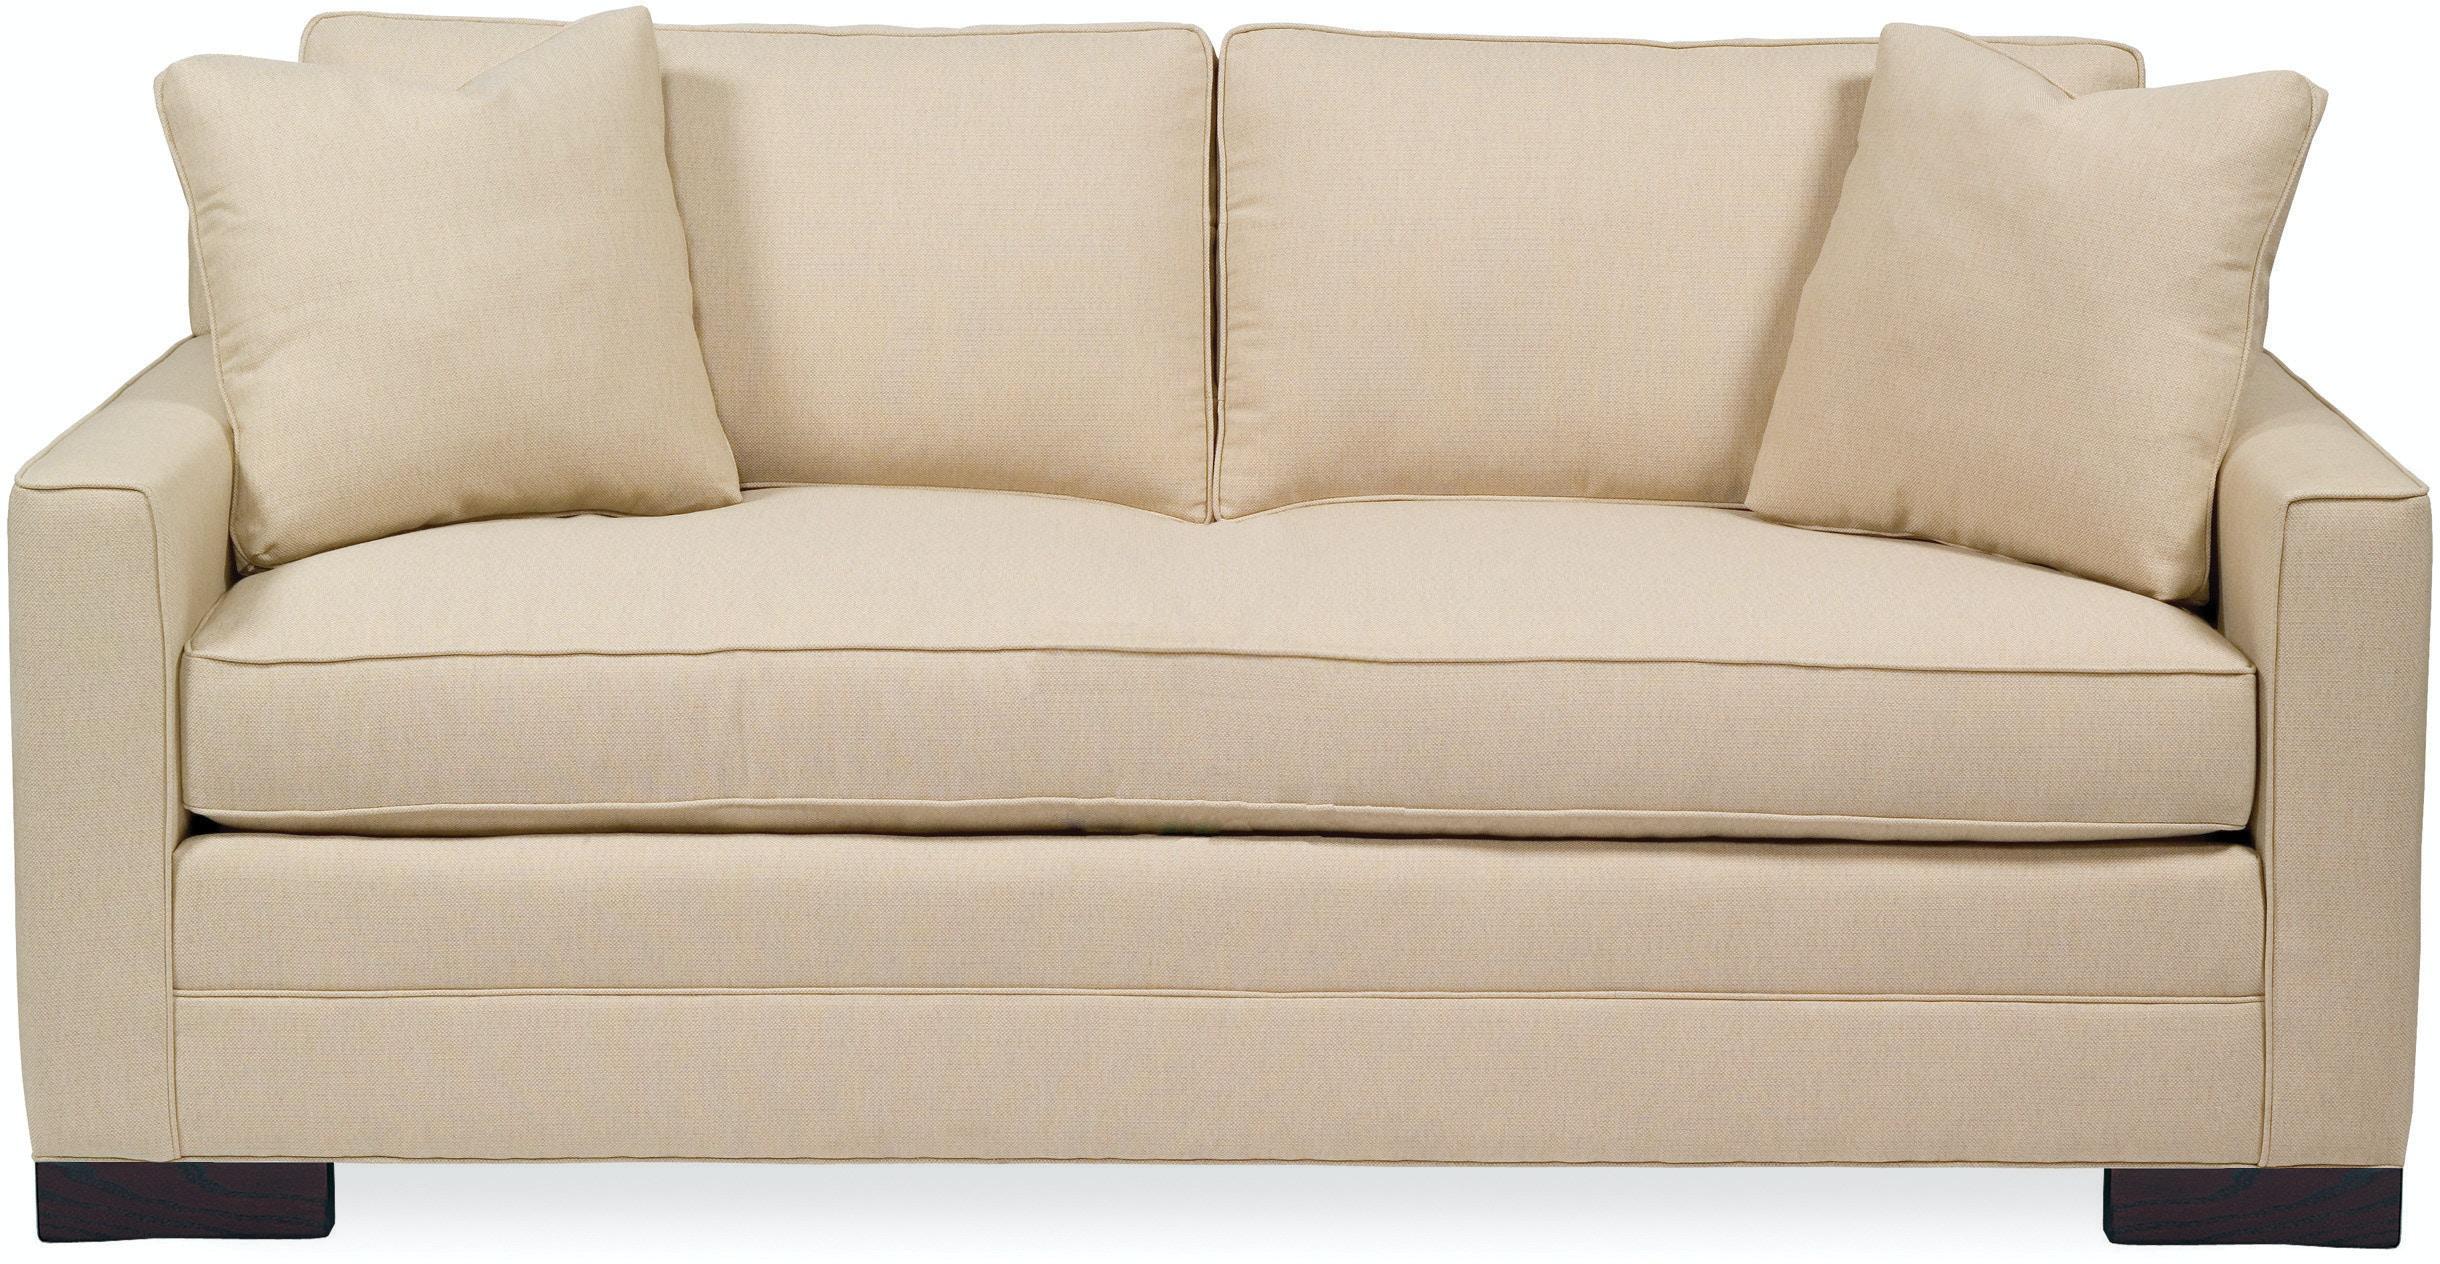 Vanguard Living Room Summerton Sleep Sofa 610 1SS Whitley